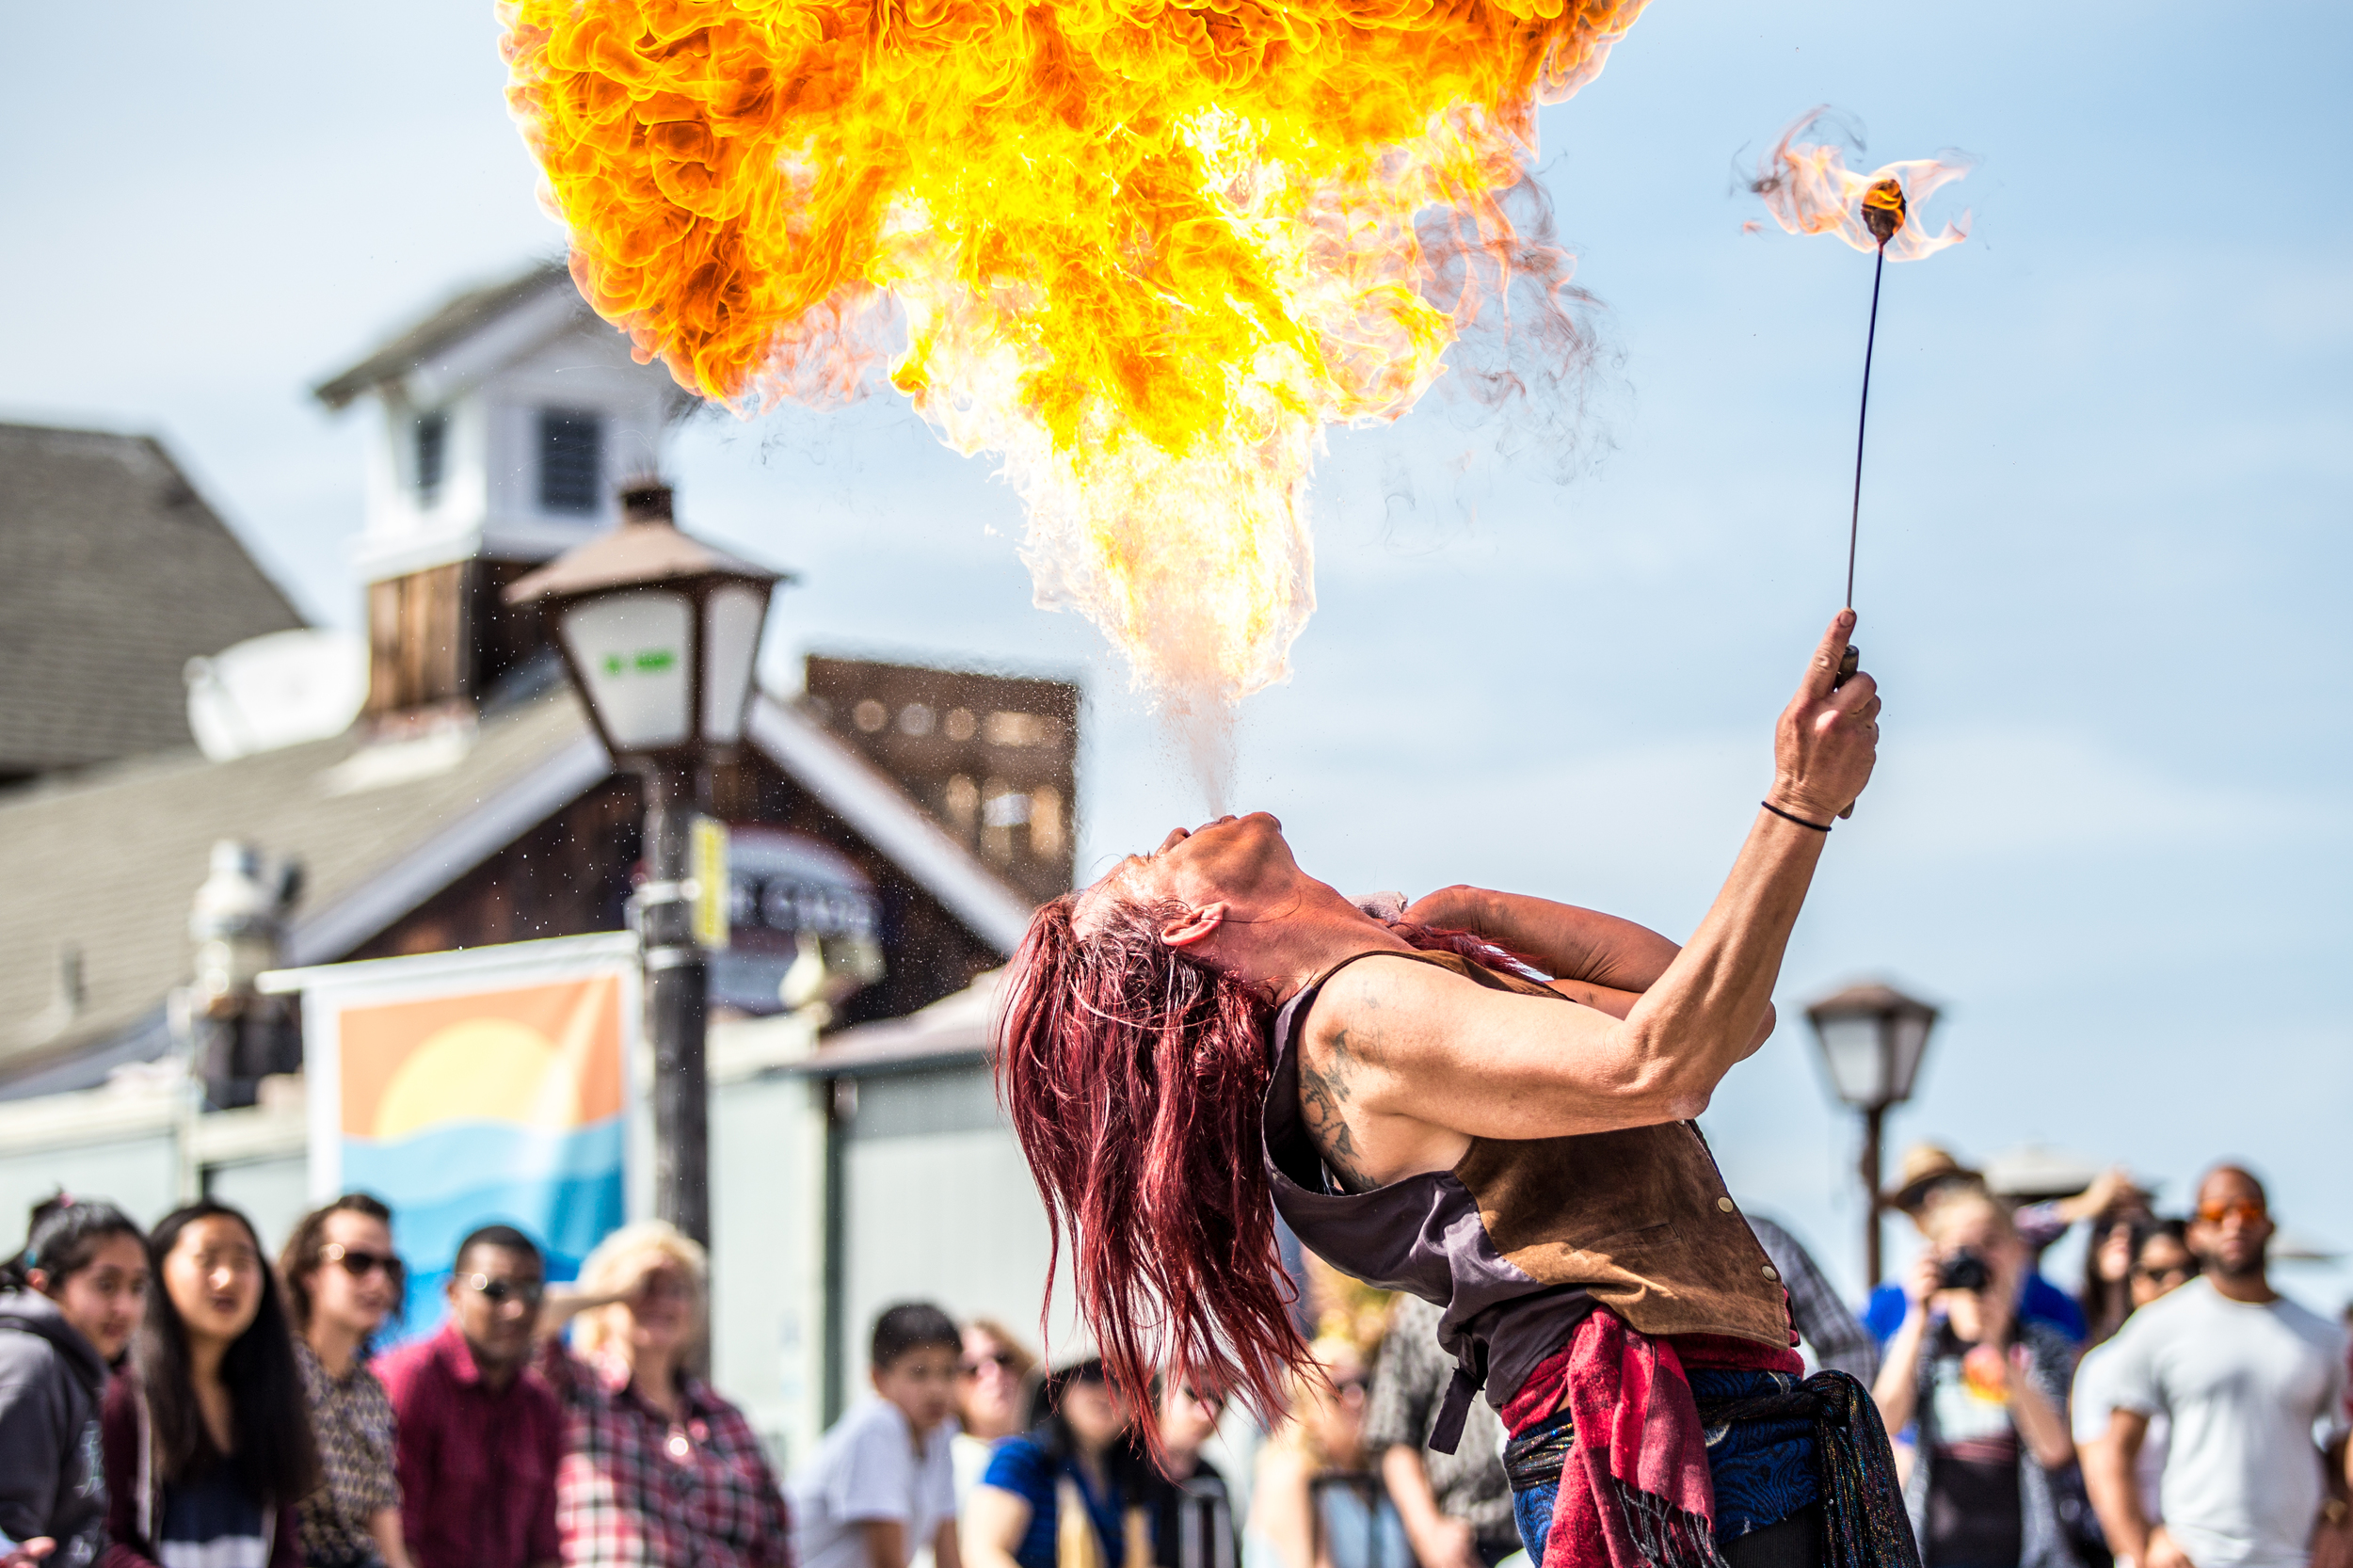 Buskers Festival Seaport Village - Murrugun the Mystic